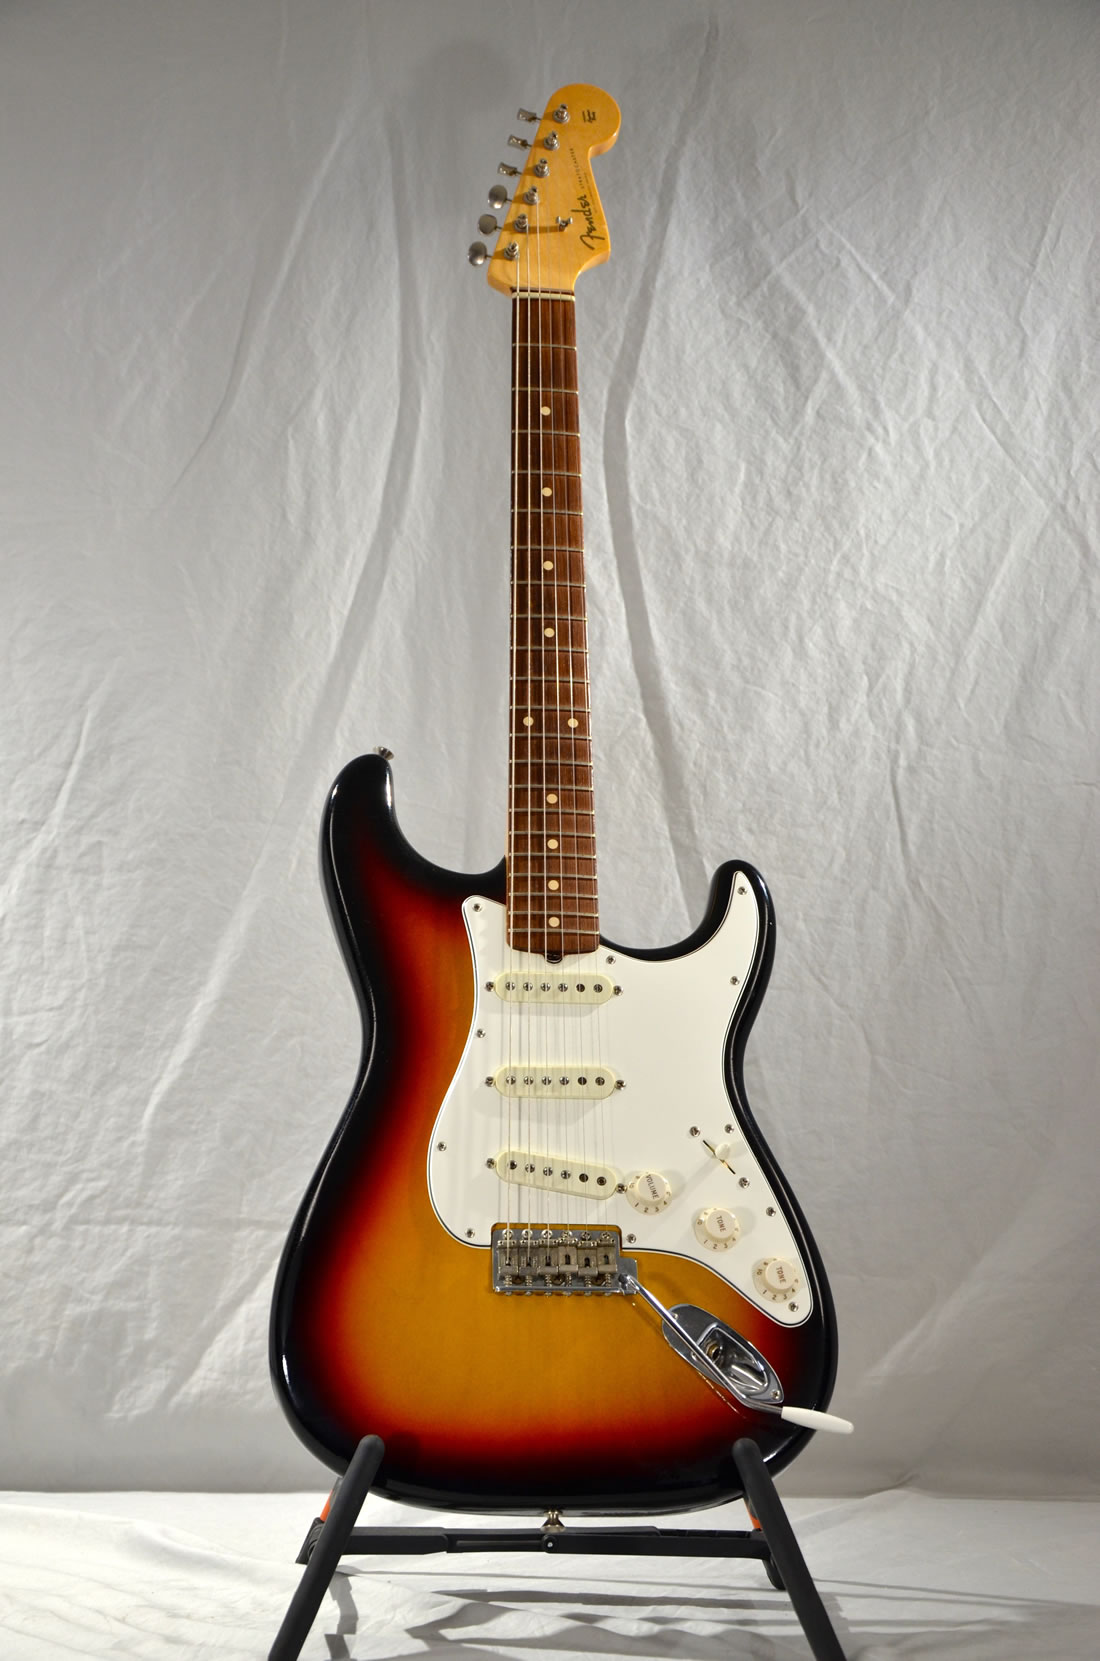 2000 Fender Stratocaster Closet Classic Reissue, Sun Burst